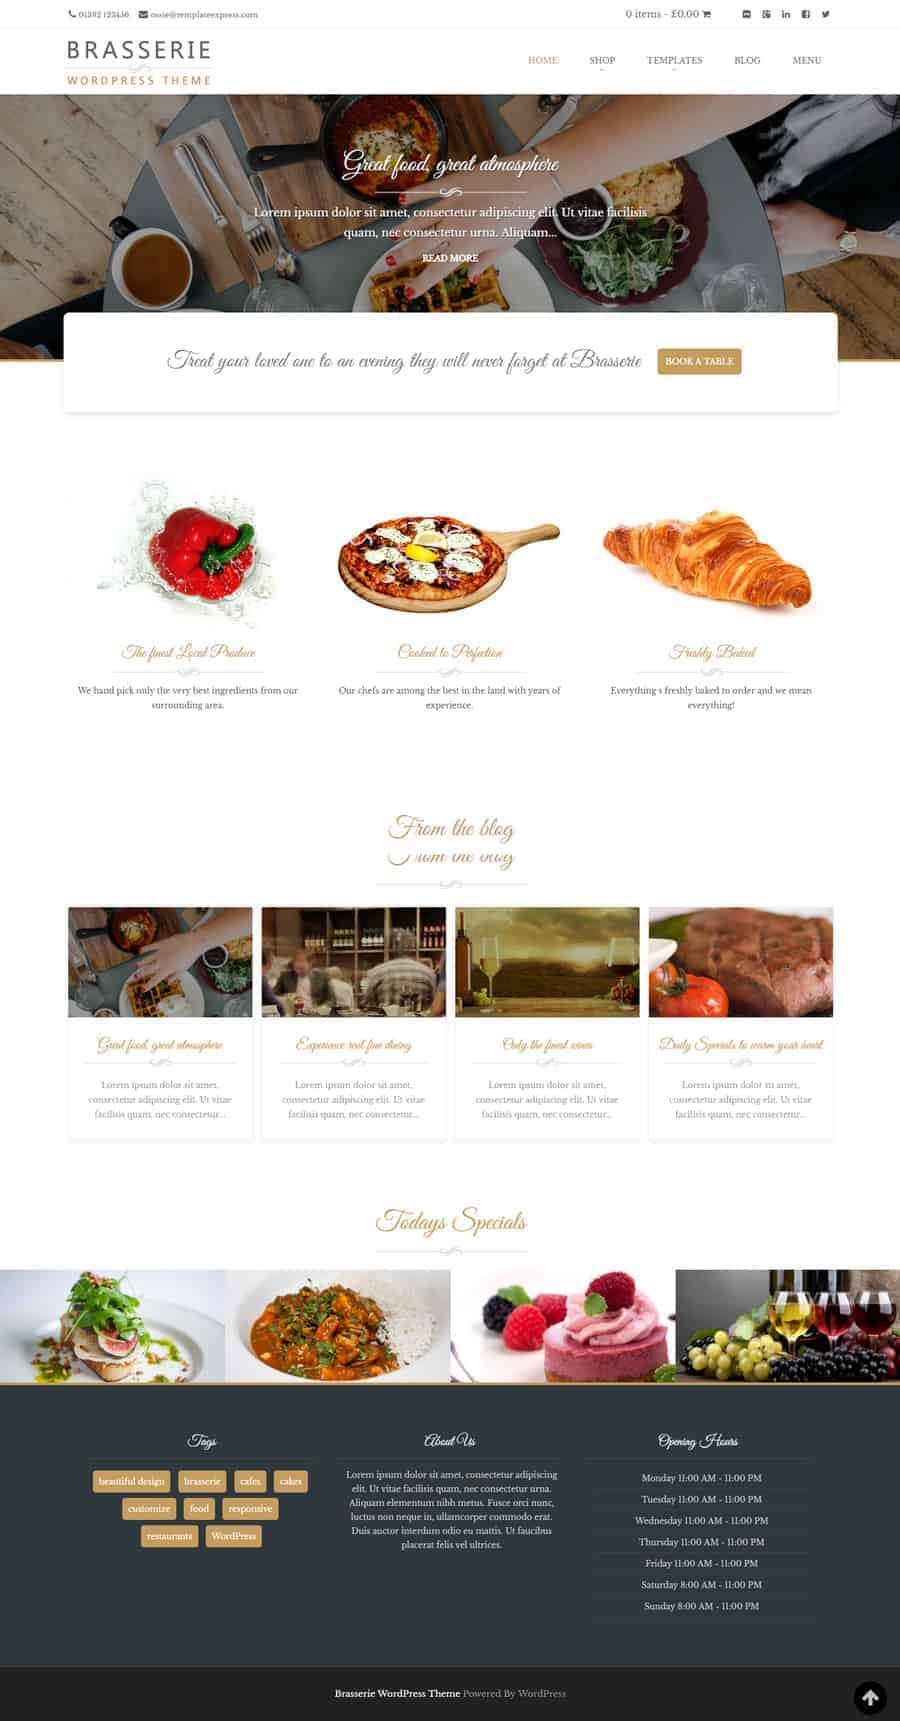 Brasserie, free WordPress theme for restaurants